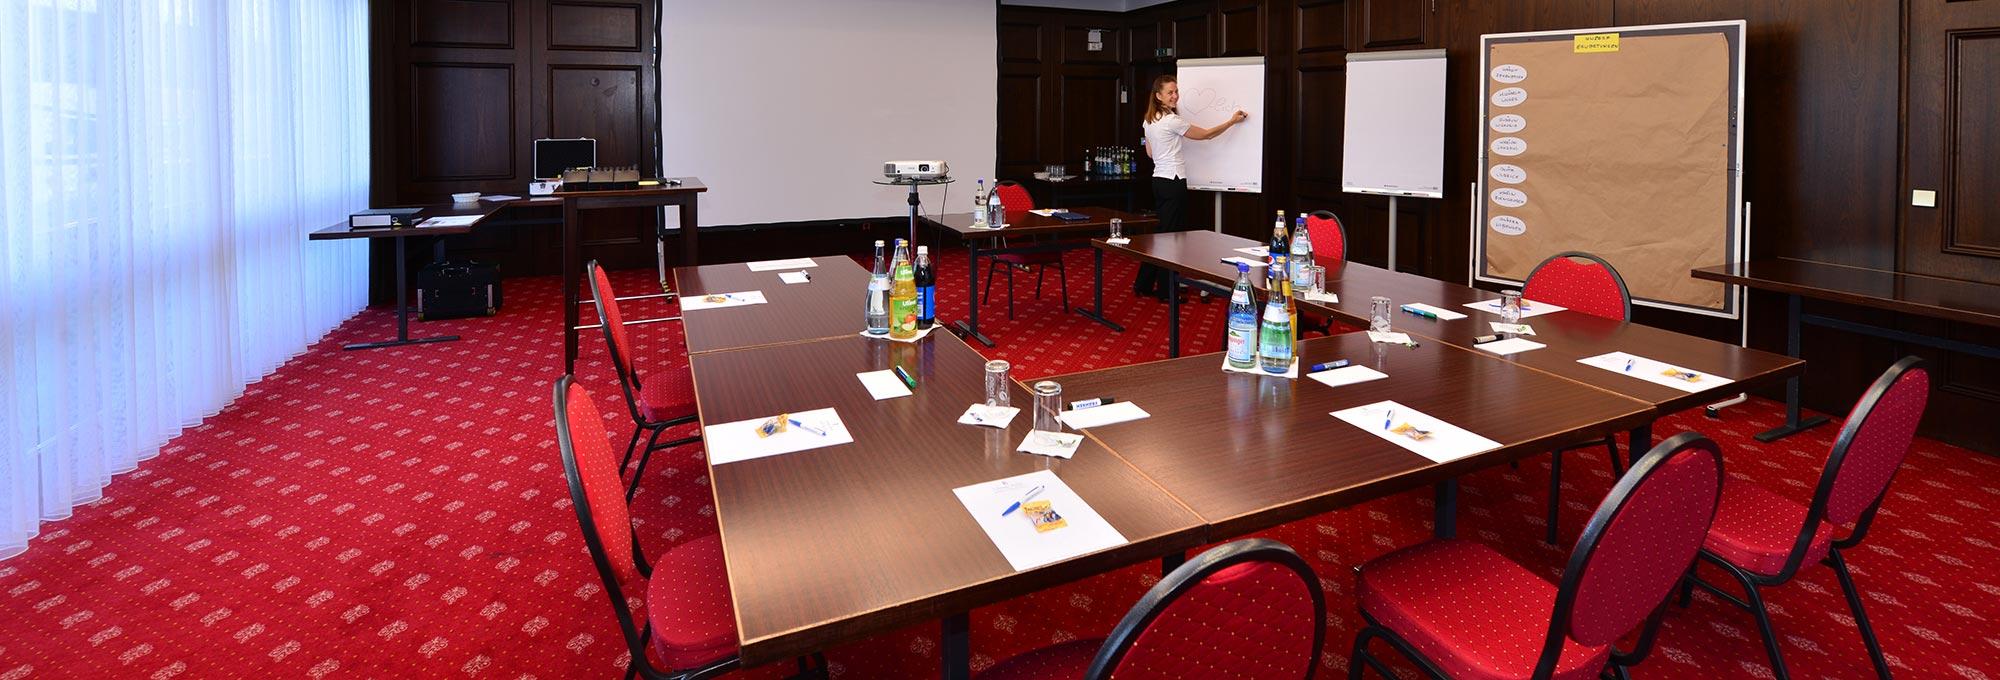 Meeting rooms near Ulm